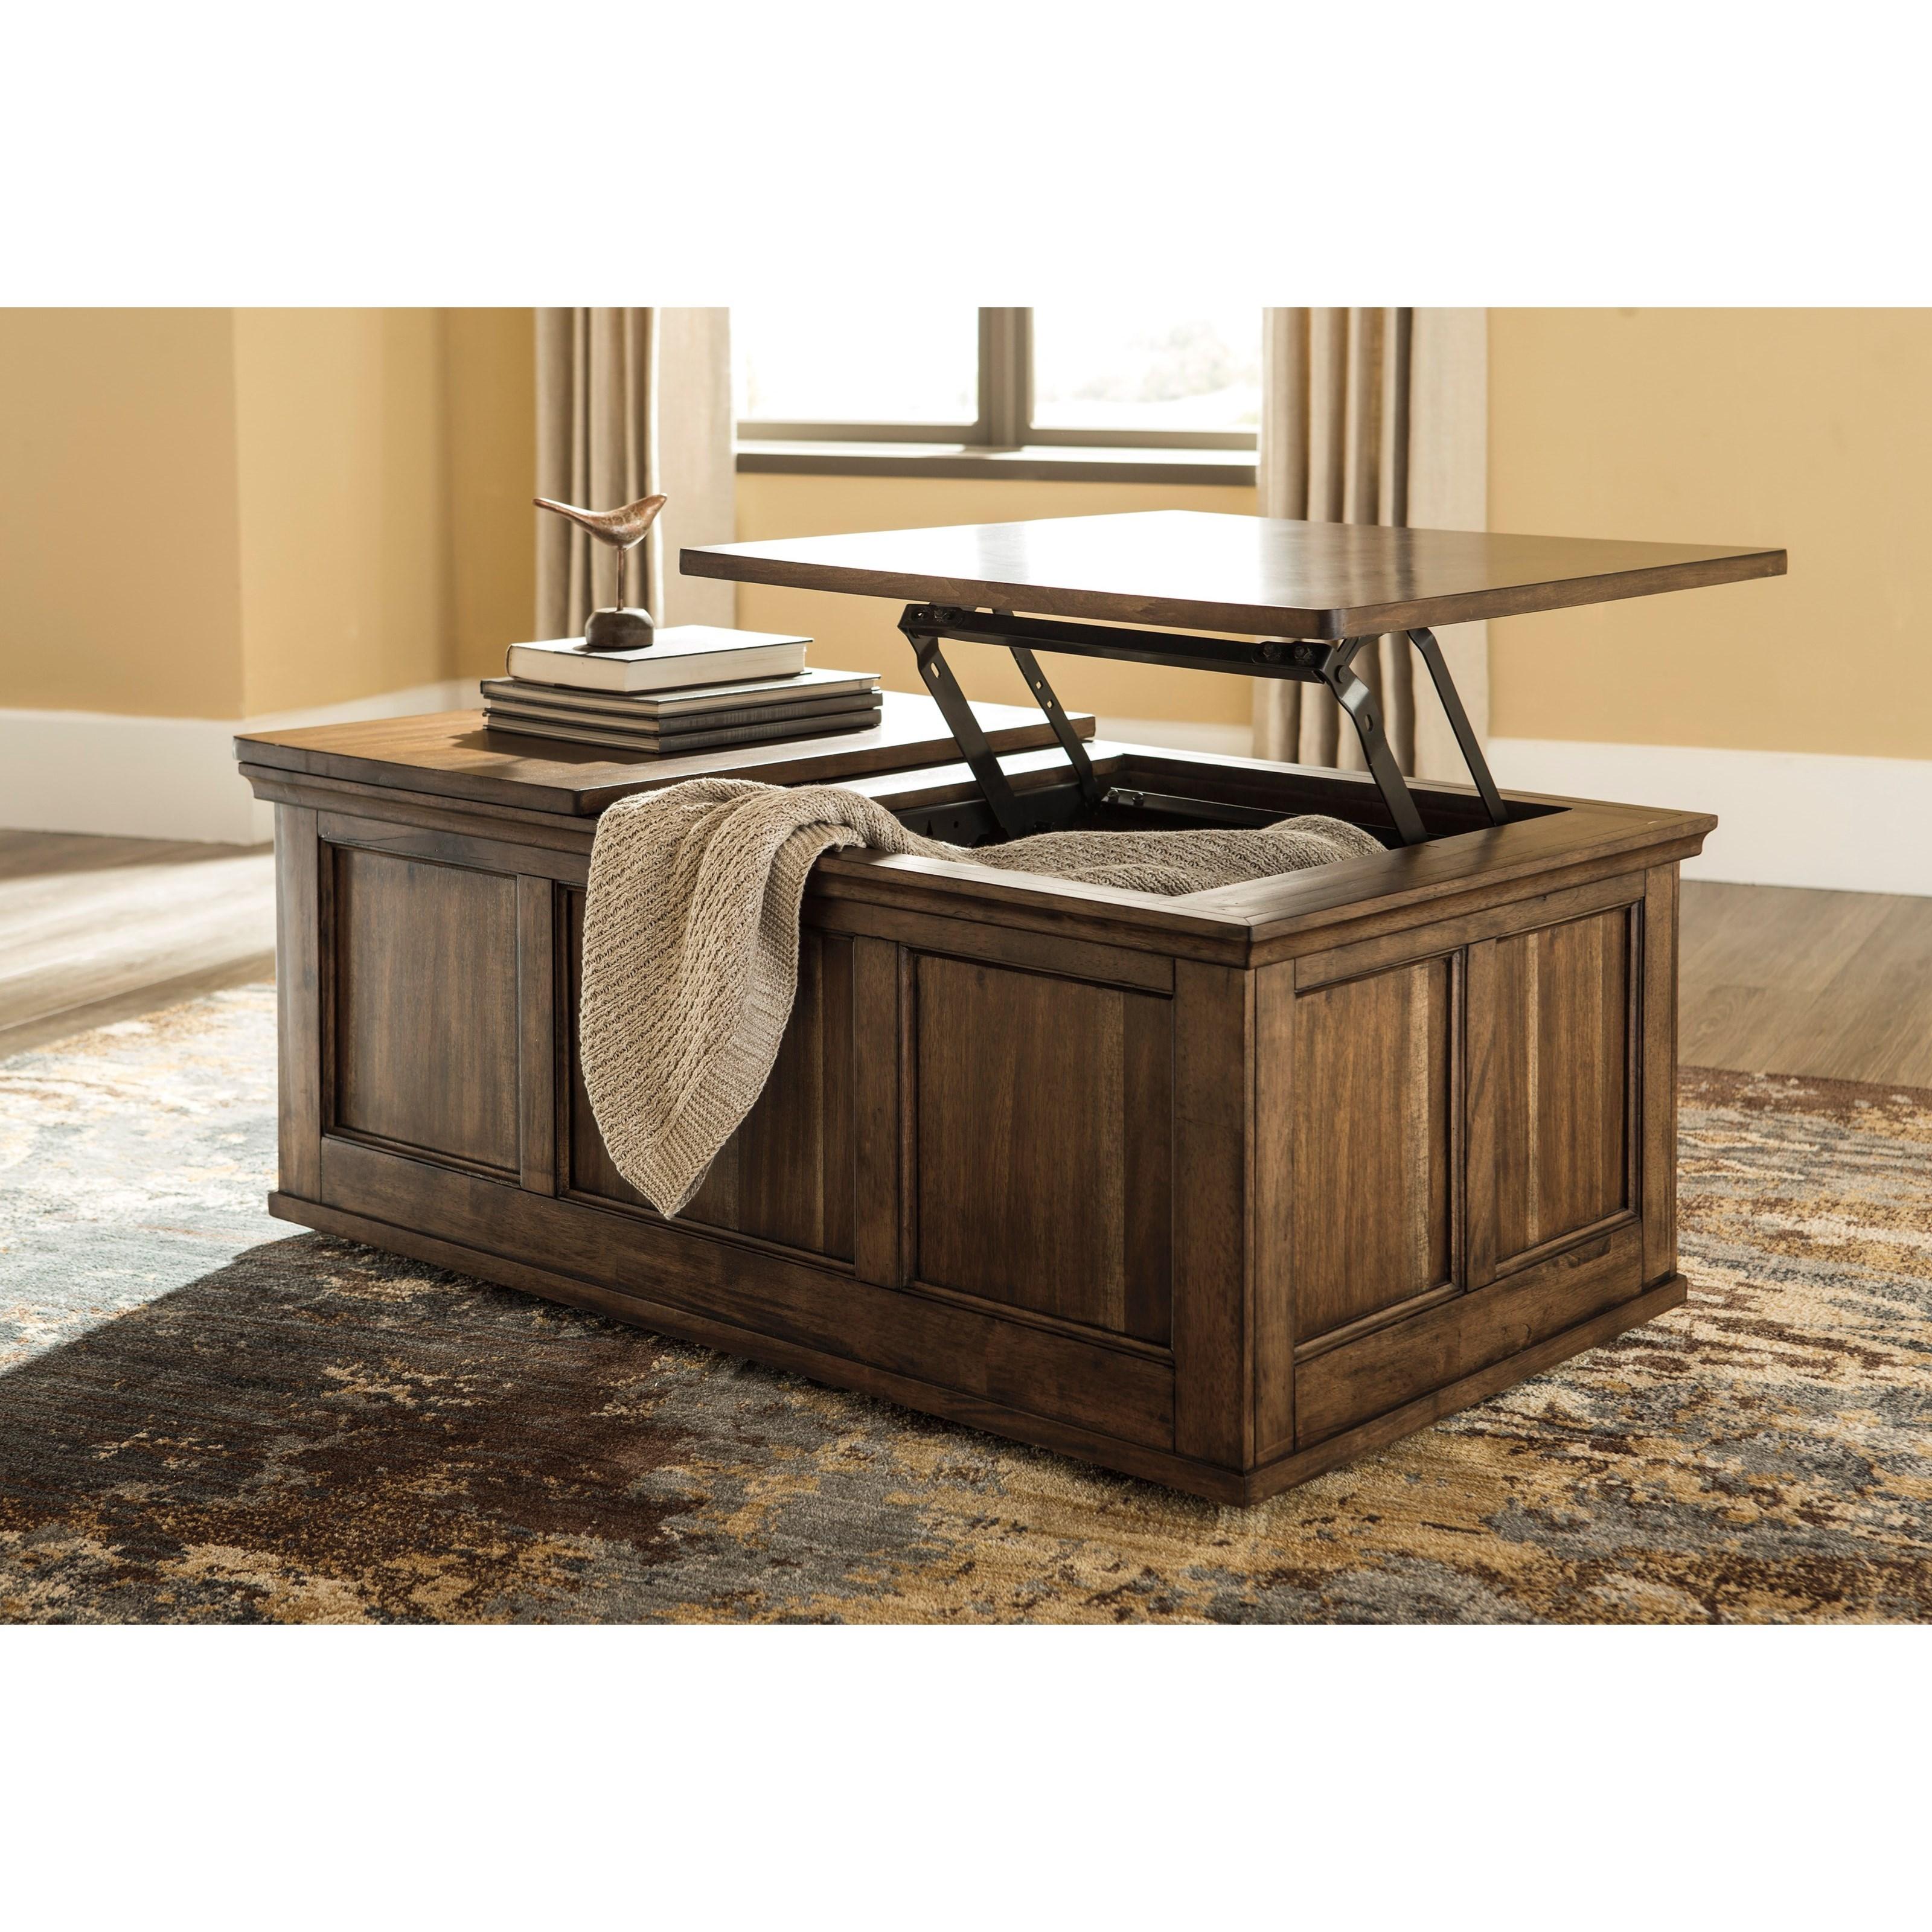 Storage Coffee Table Ashley: Signature Design By Ashley Flynnter T919-9 Transitional